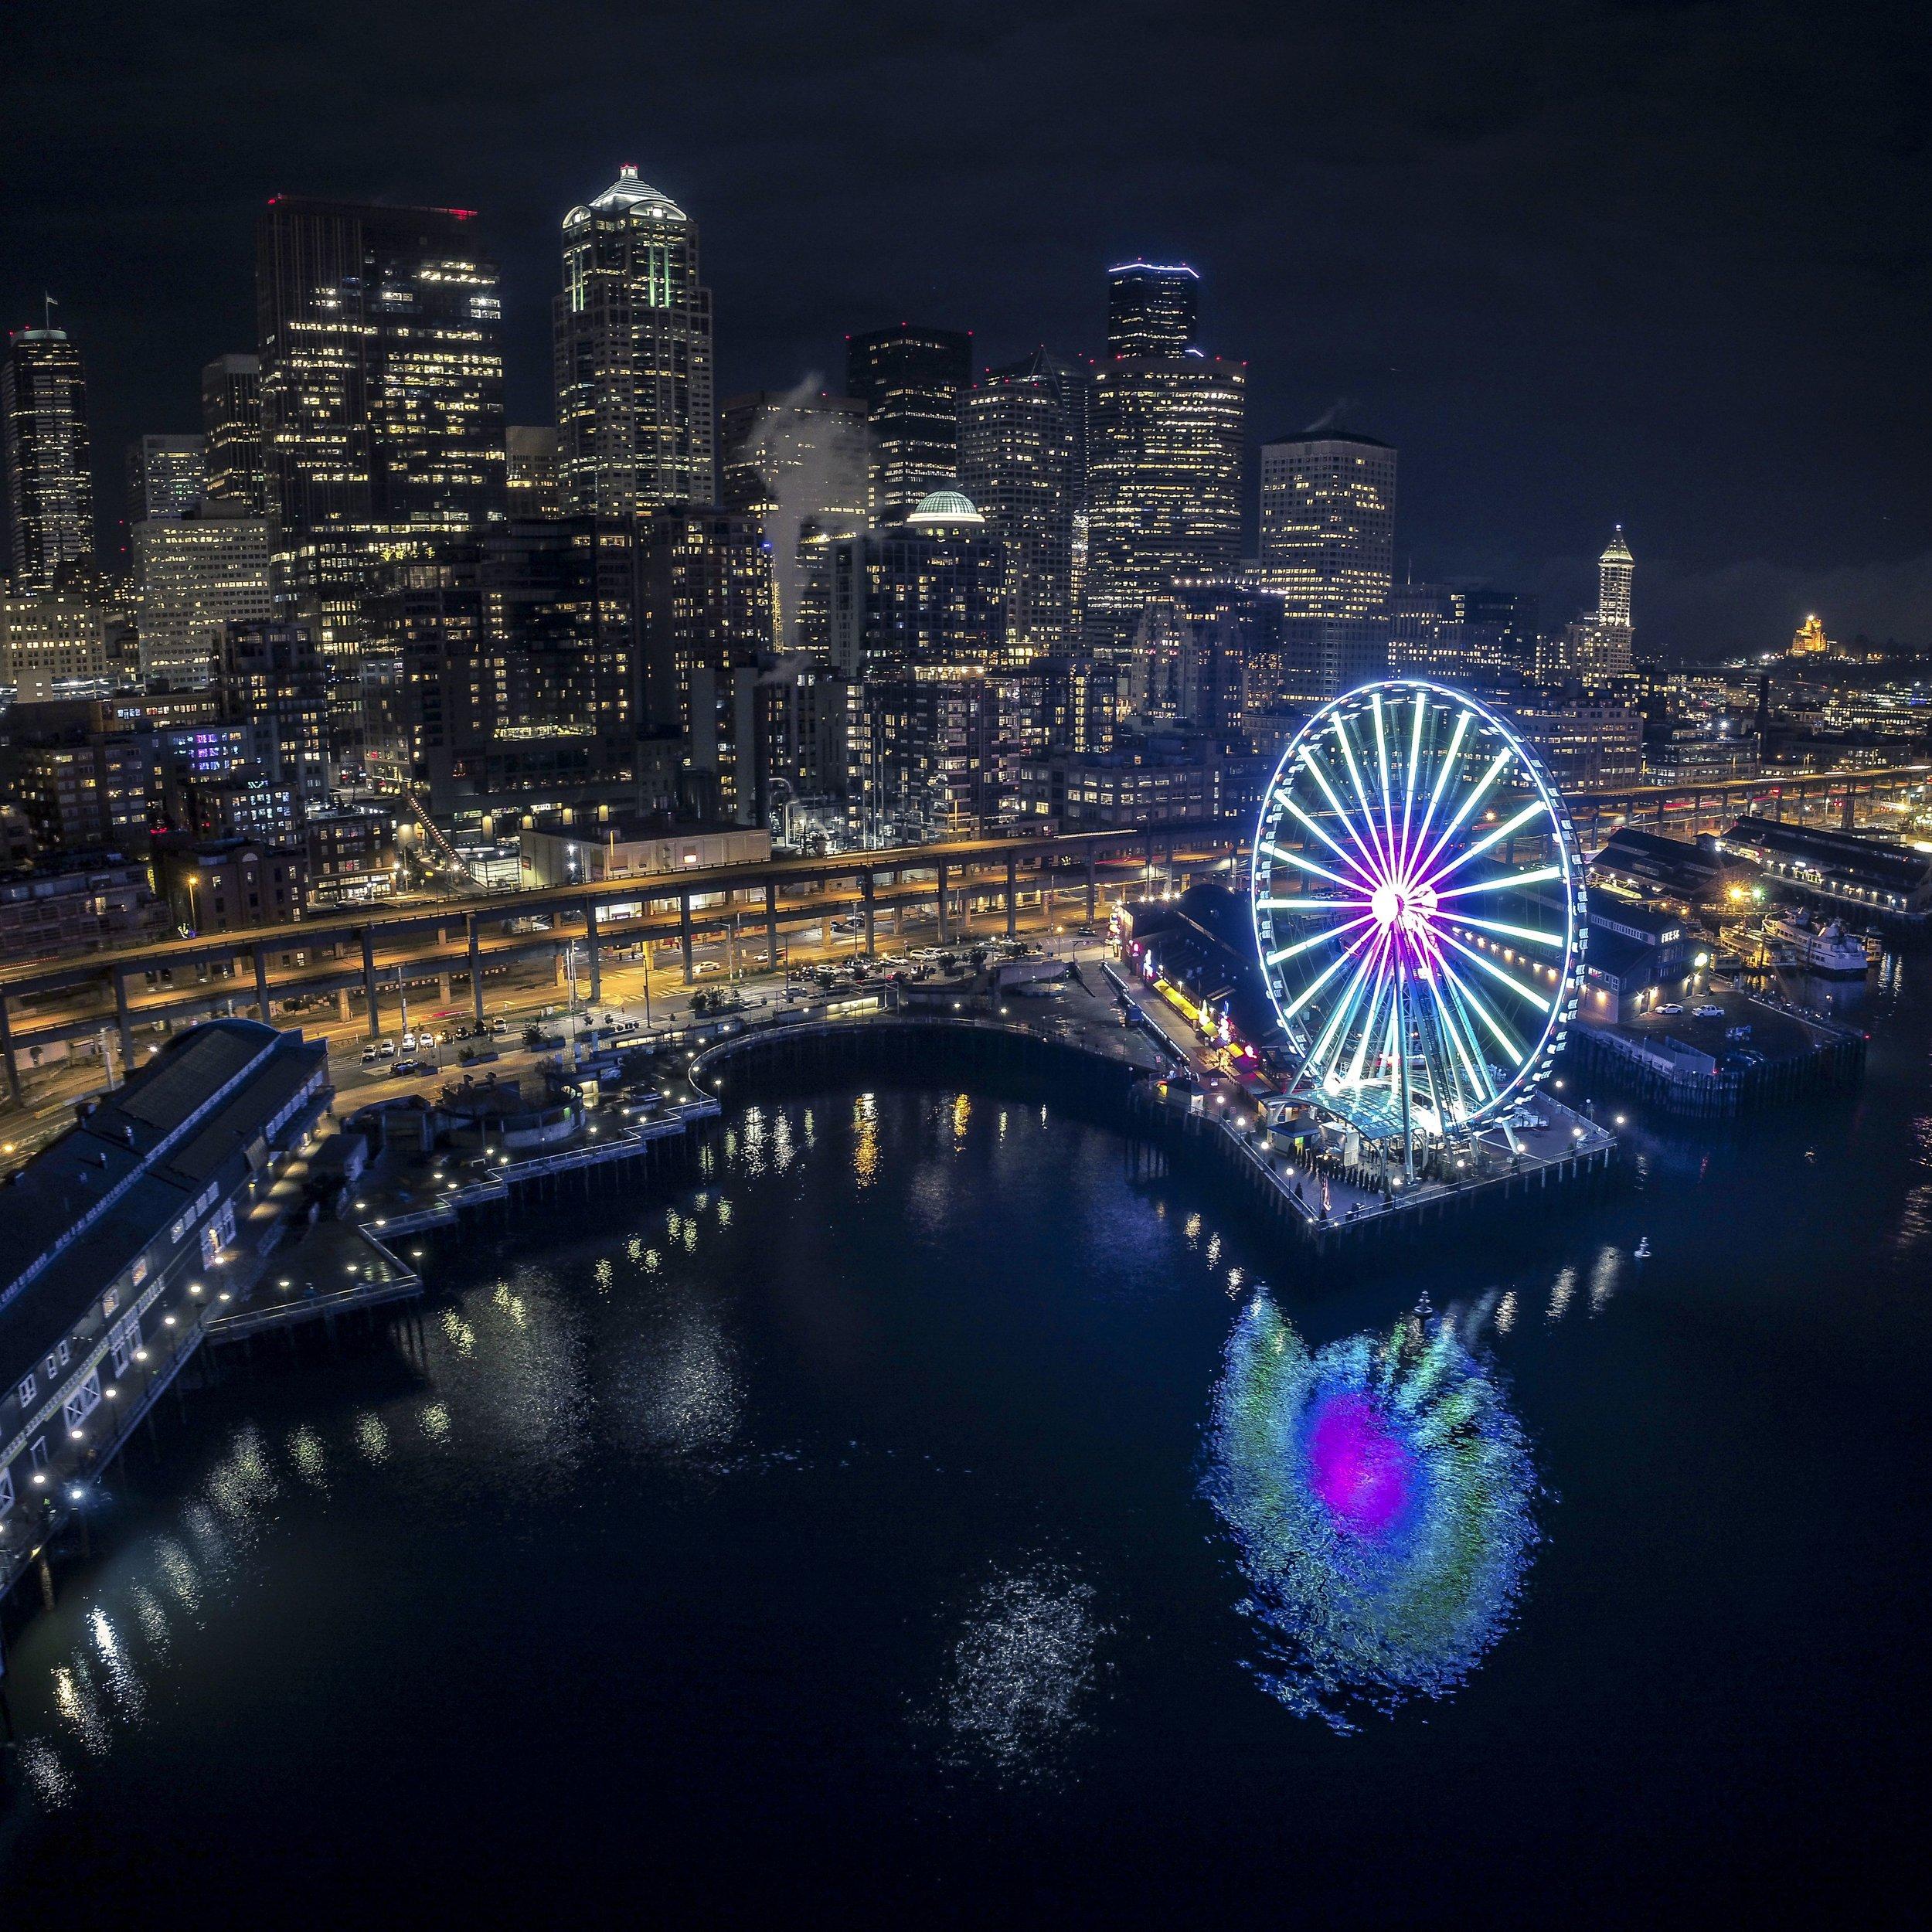 Seattle_Waterfront_Night_Aerial_of_Great_Wheel_Web.jpg